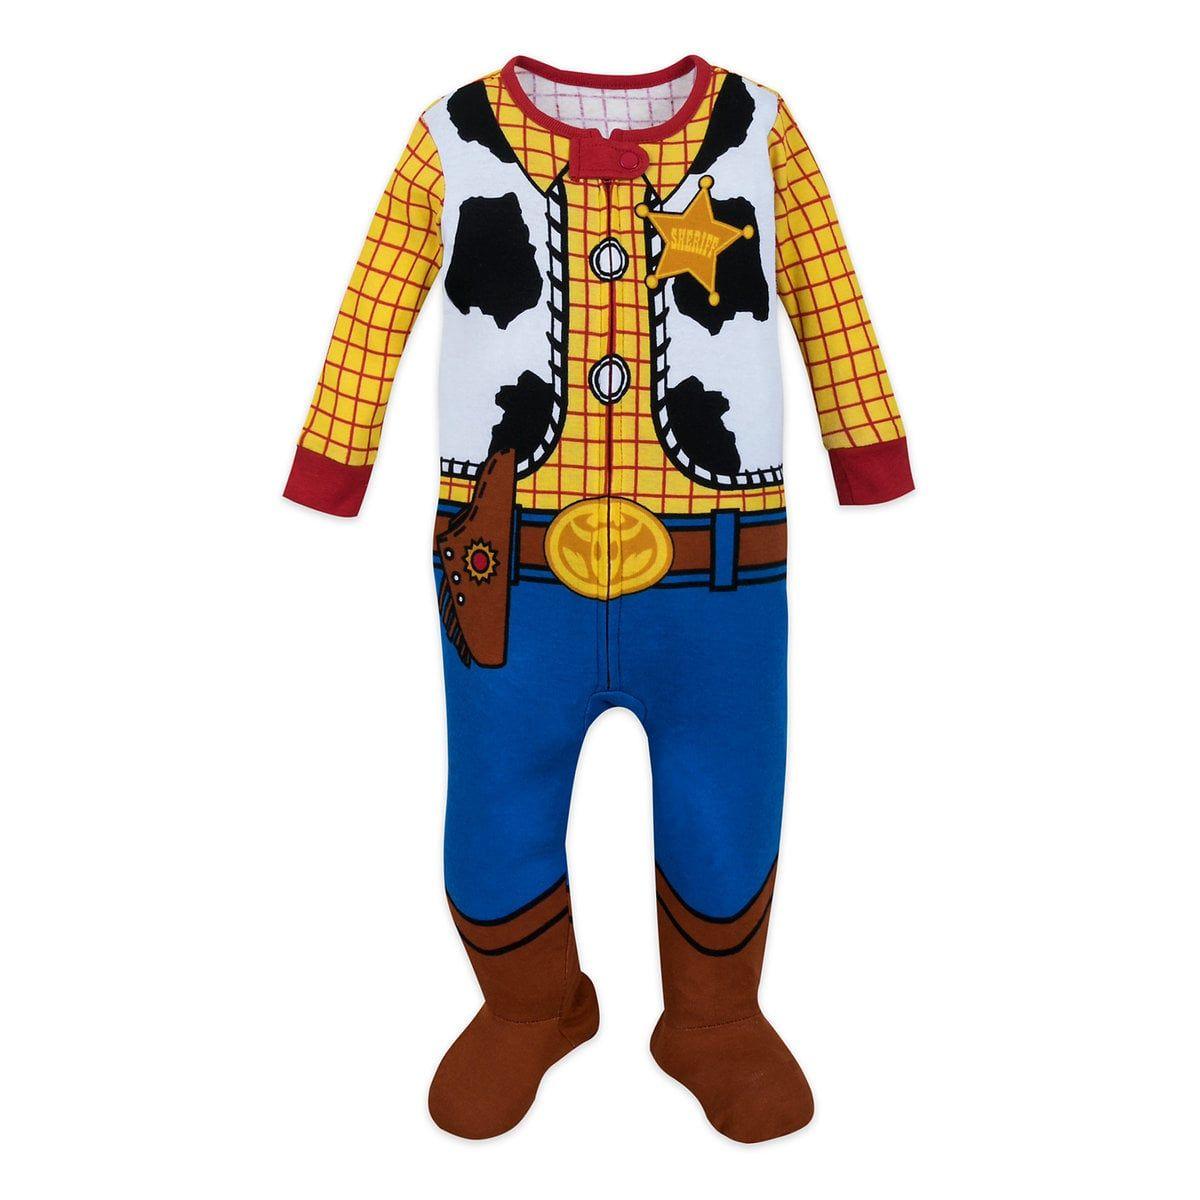 NWT Disney Store Buzz Lightyear Costume Sleeper 0 3 6 9 12 18 24mo Baby Boy